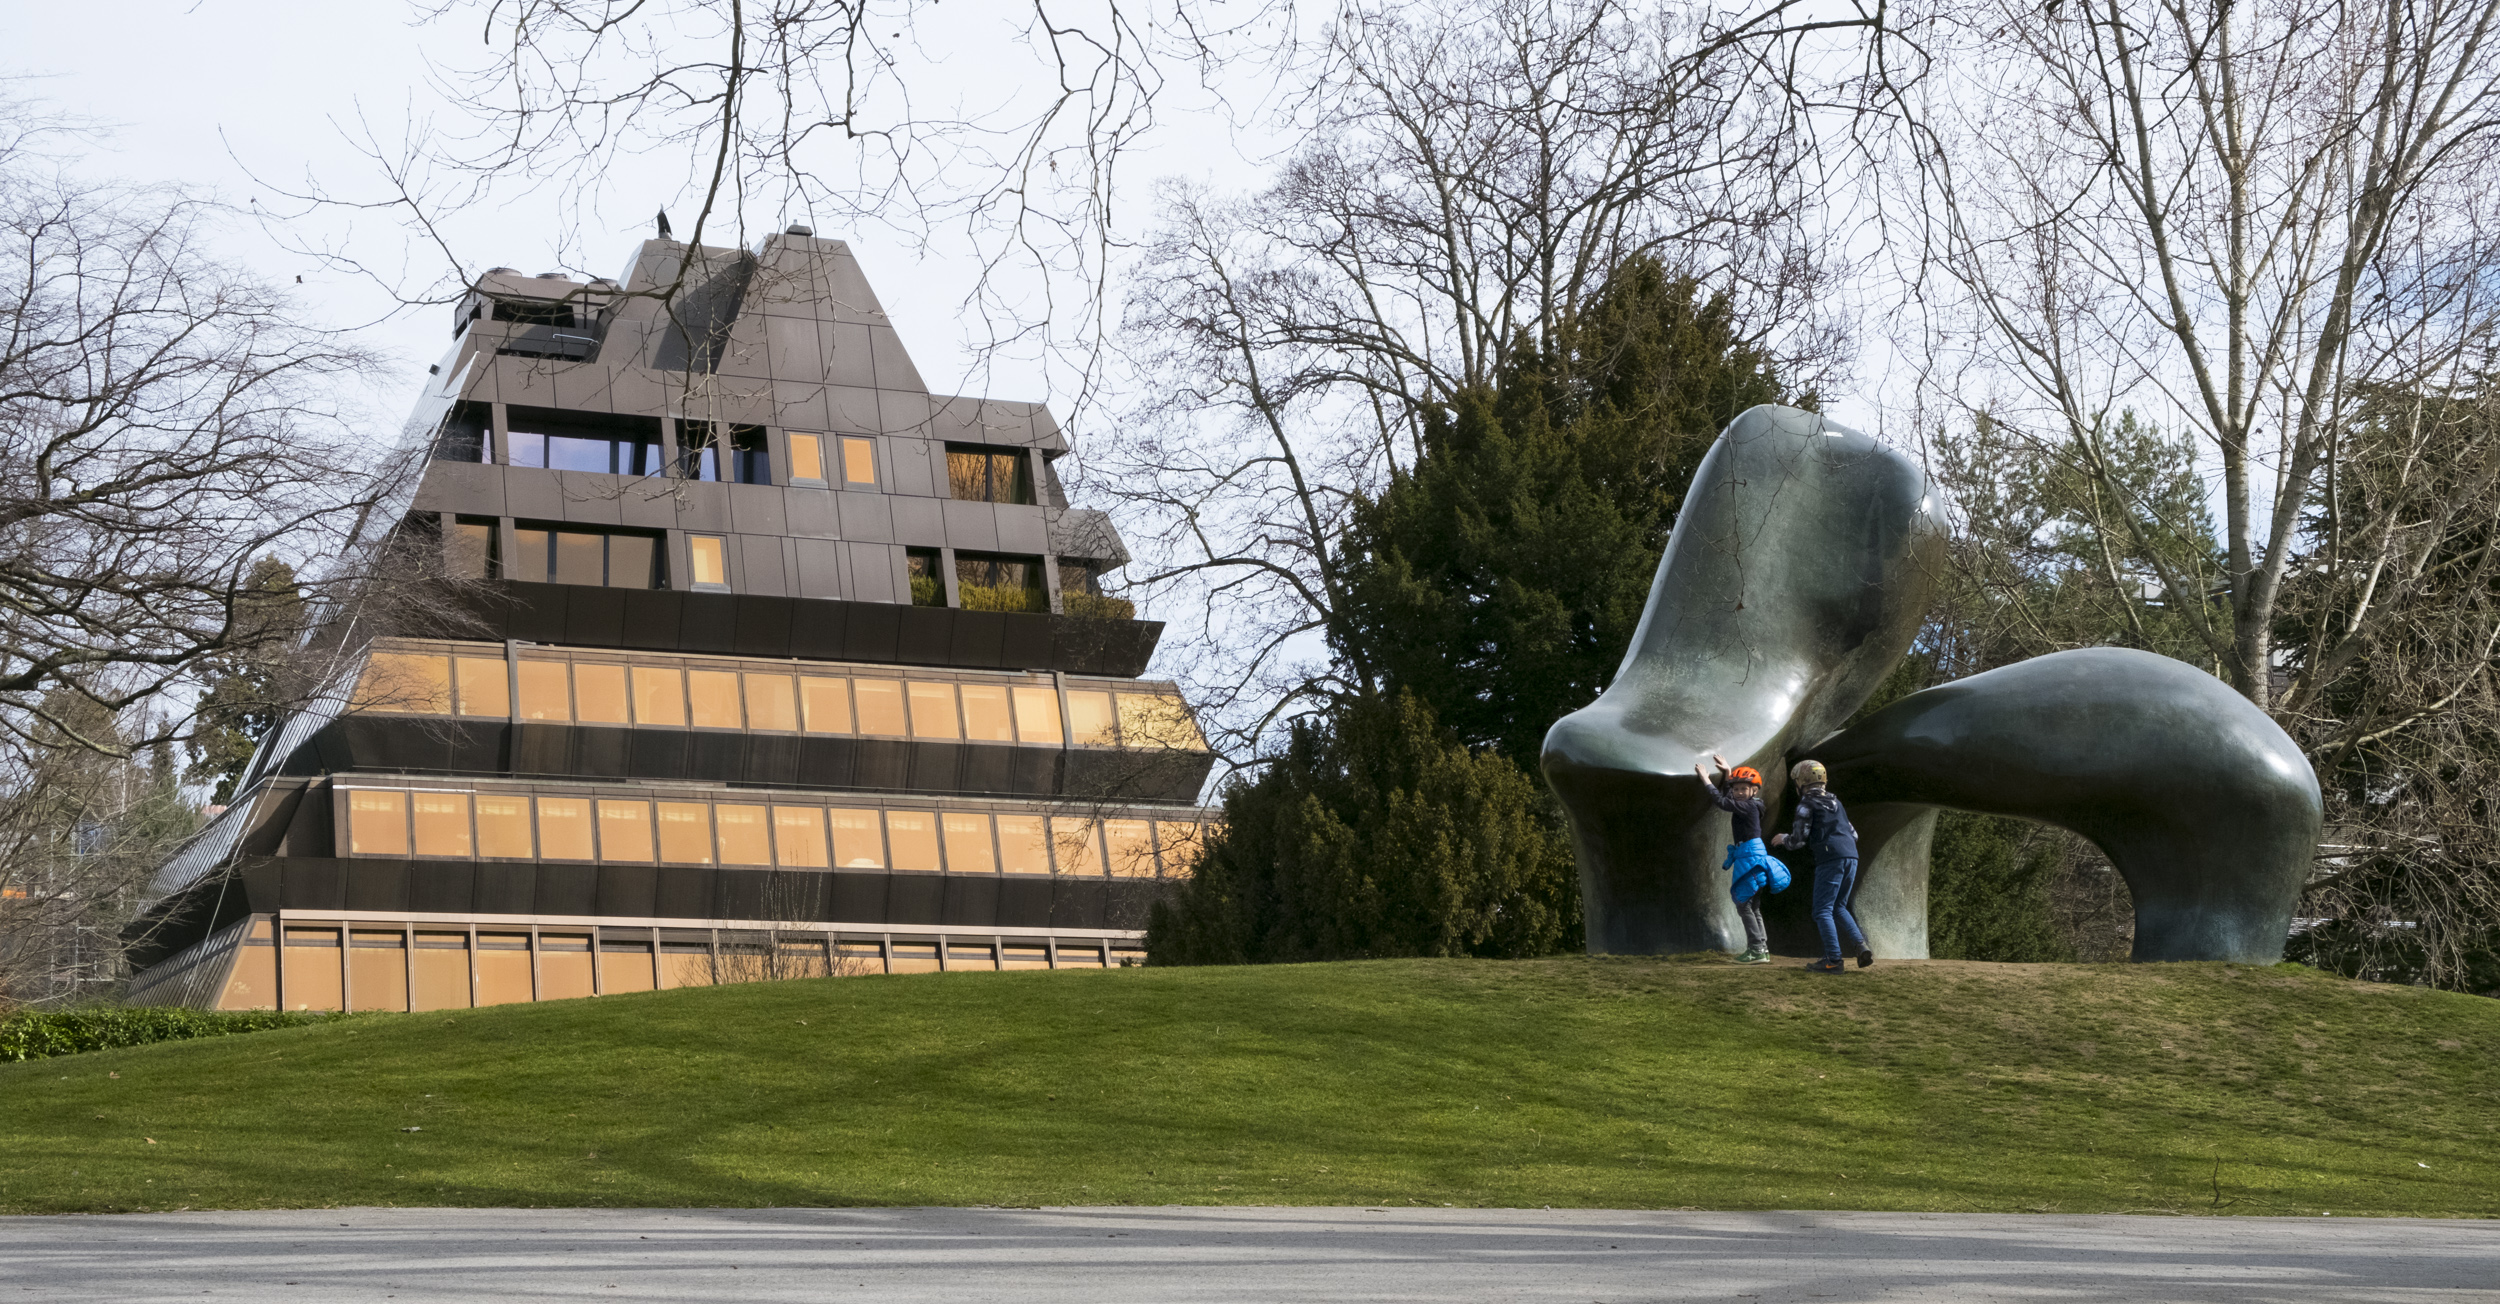 Klinik Pyramide am See